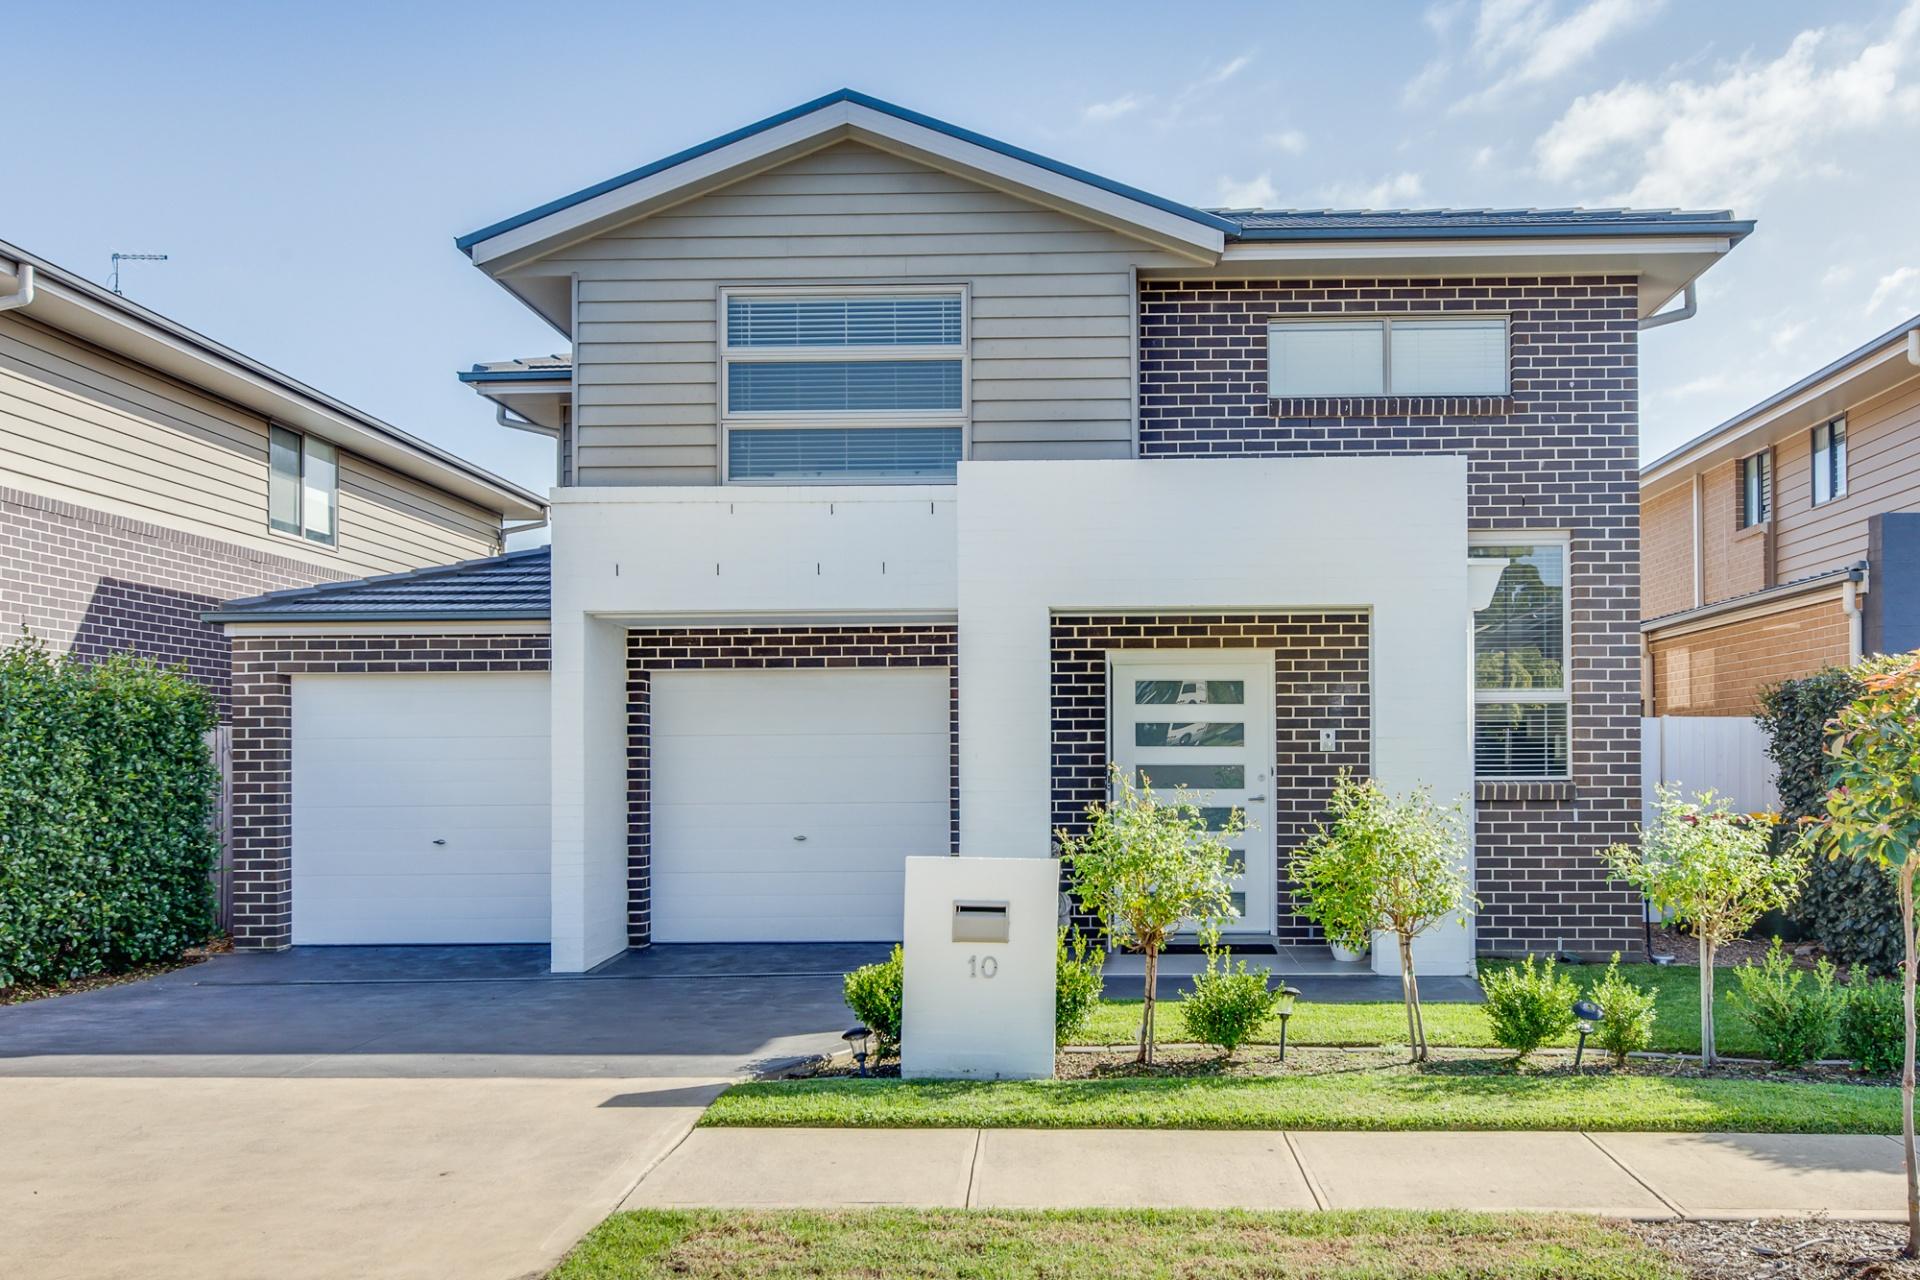 4 Rooms, House, Leased, Eumina Street, 2 Bathrooms, Listing ID 1290, The Ponds, NSW, Australia, 2769,